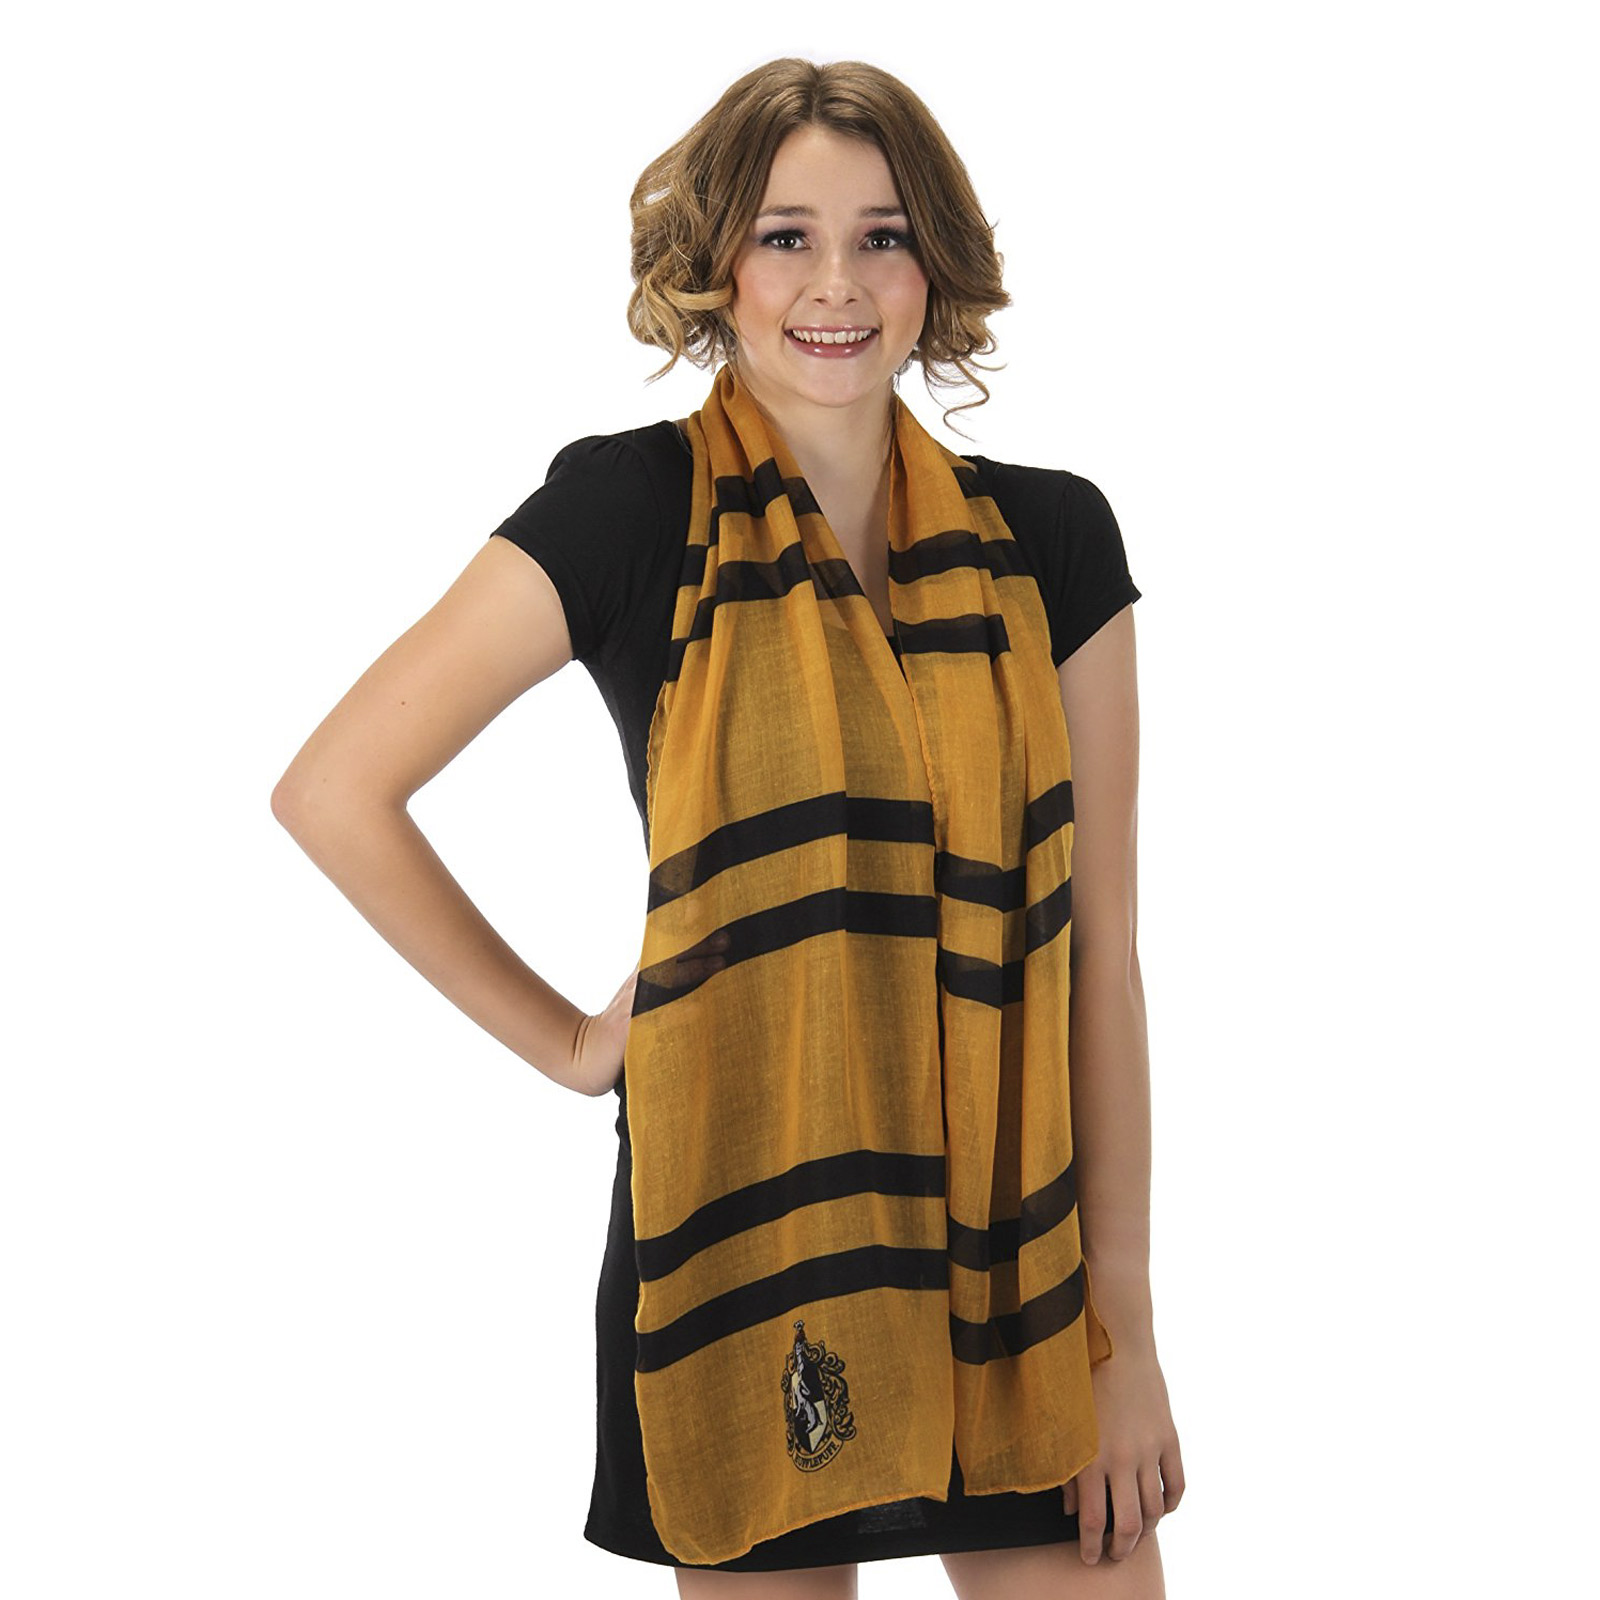 Hufflepuff Lightweight Yellow Scarf Harry Potter Halloween Costume